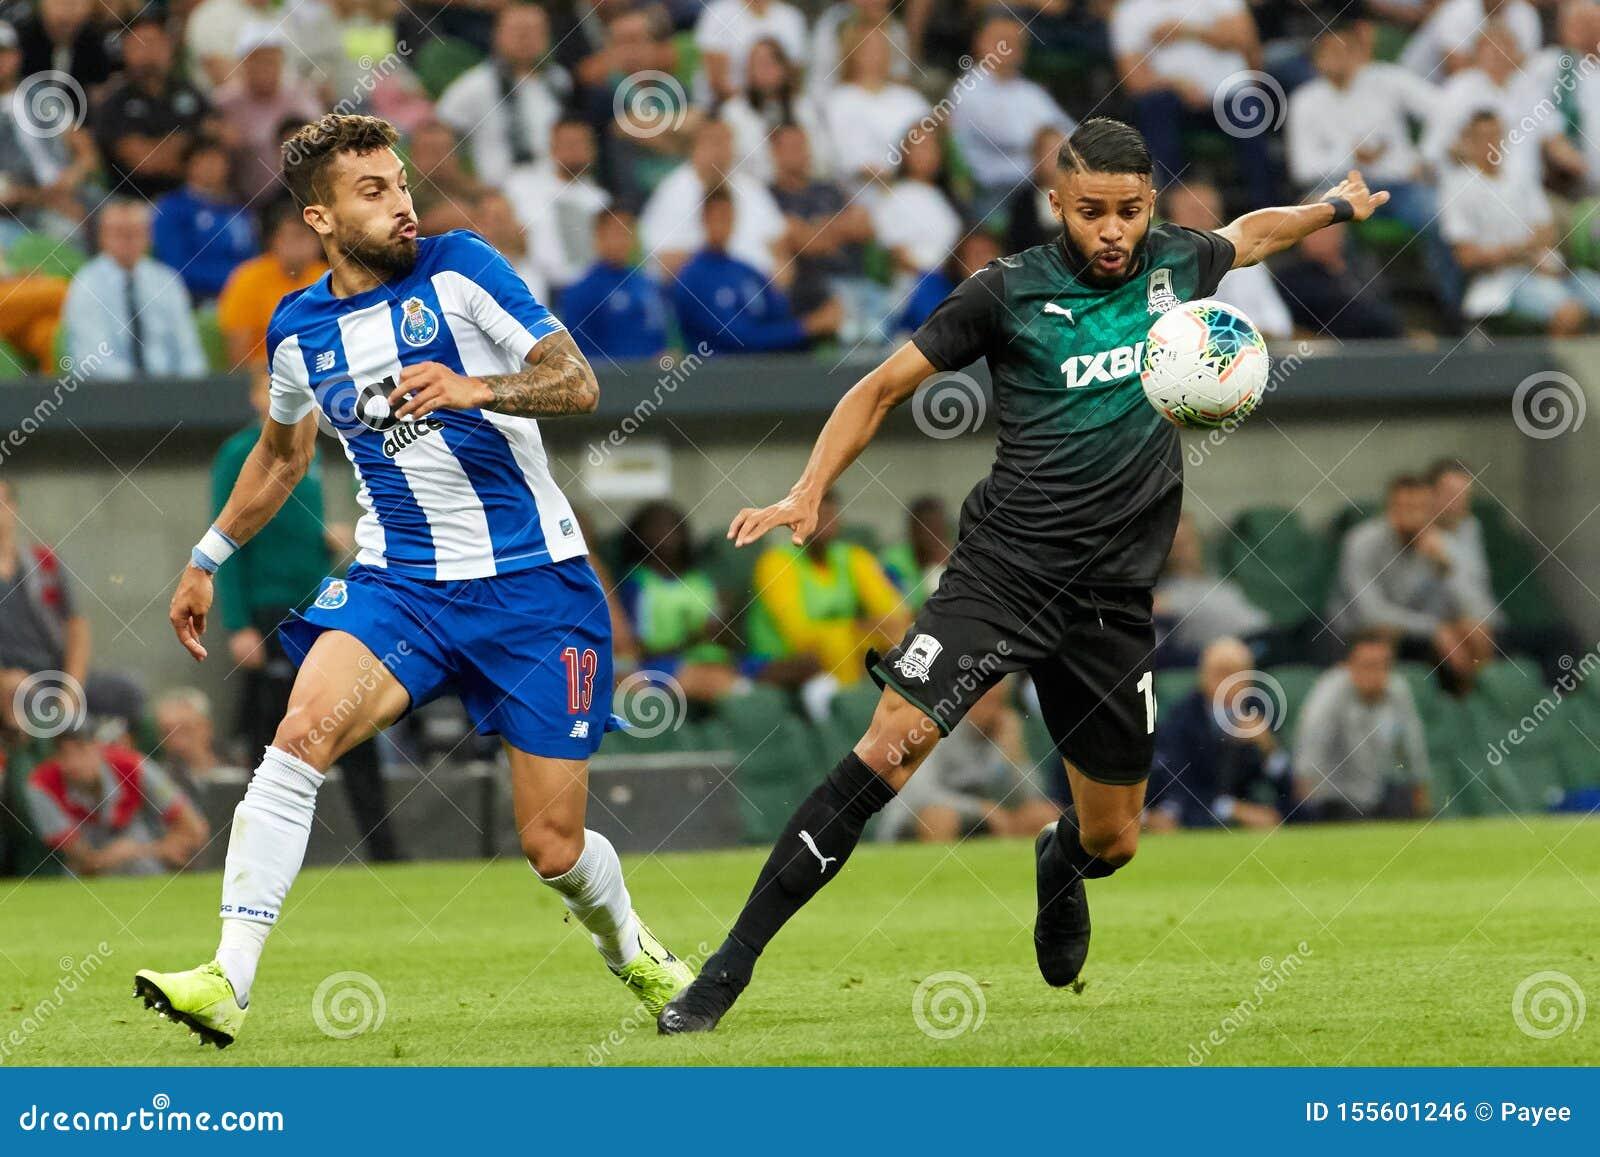 Wanderson Of Fc Krasnodar In Action Editorial Photo Image Of Action Stadium 155601246